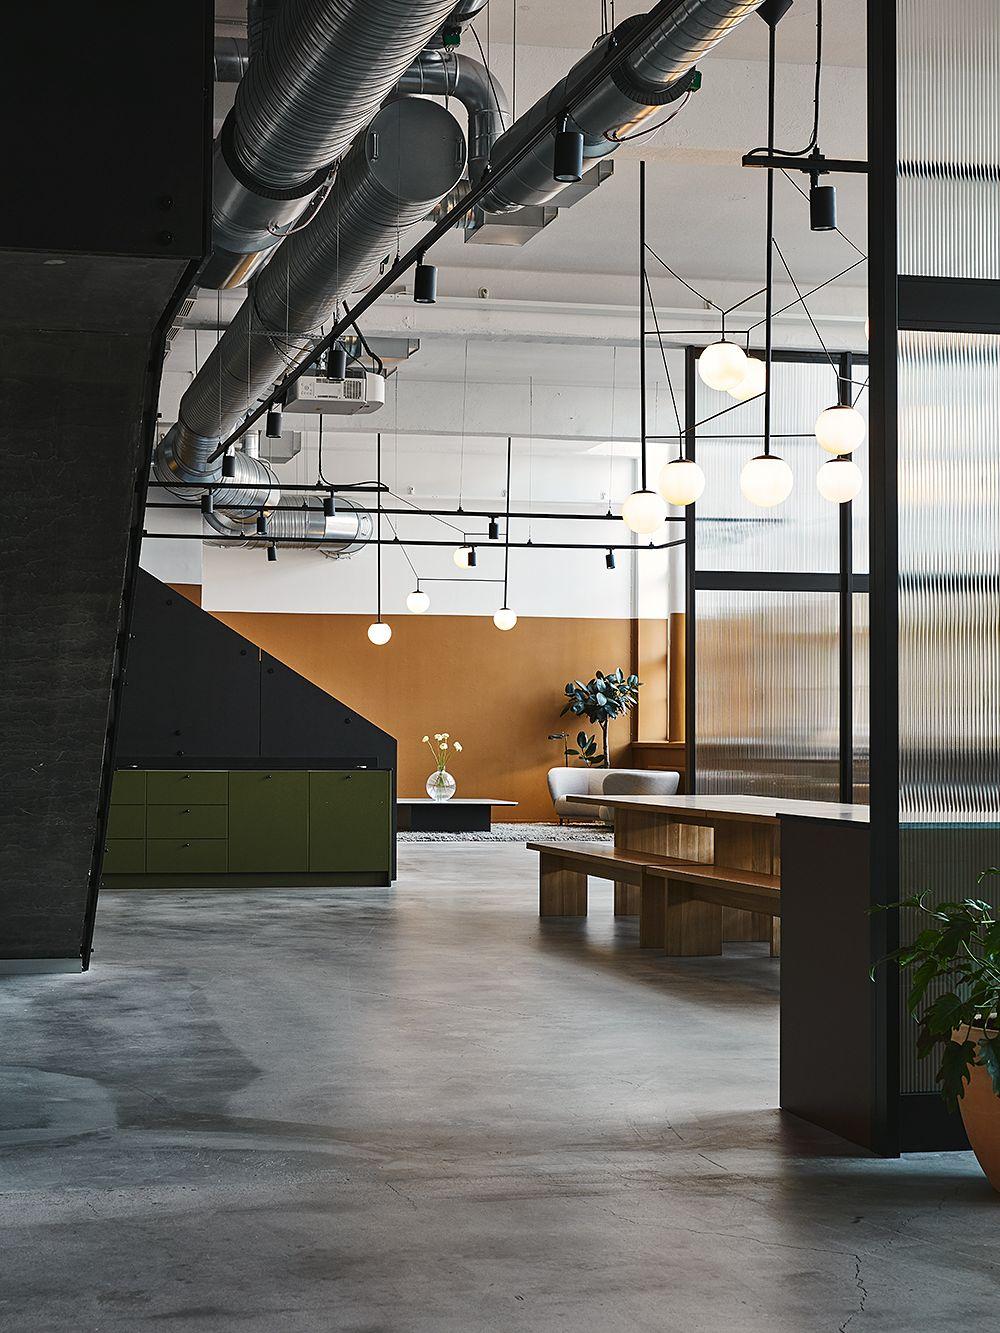 Bob the Robot's new office by Studio Joanna Laajisto